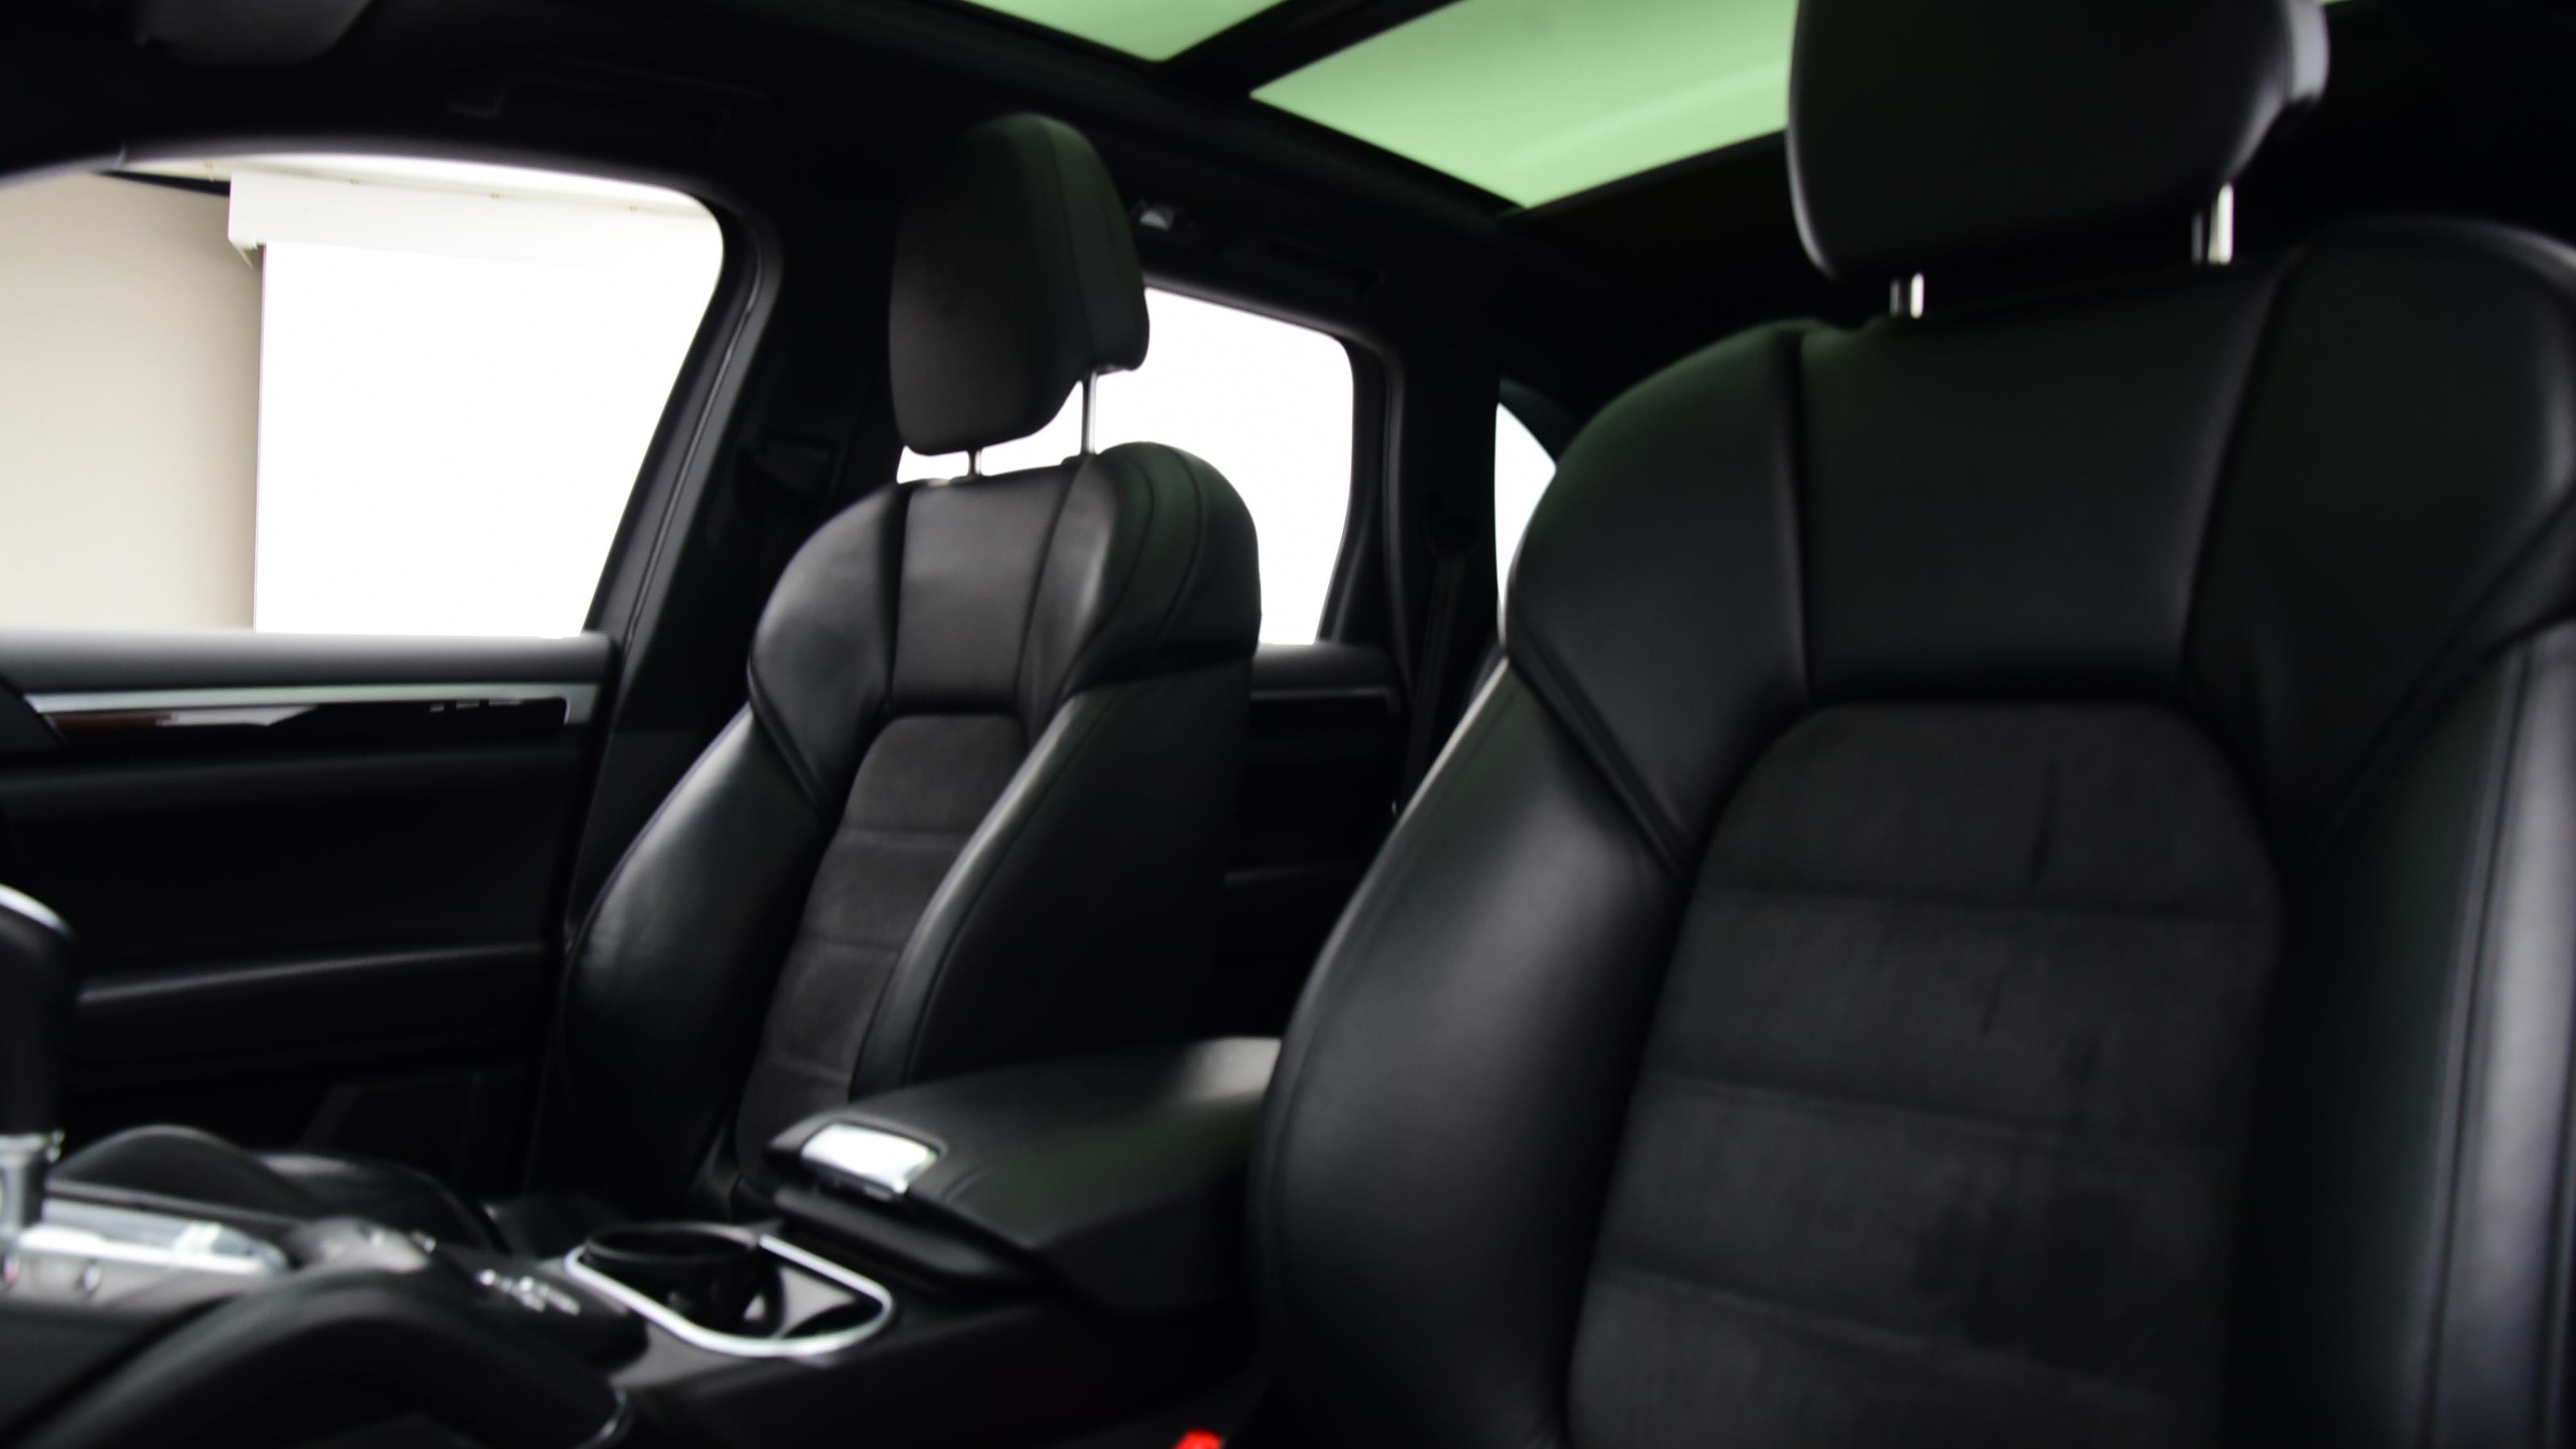 Used 2017 Porsche CAYENNE S Platinum Edition E-Hybrid 5dr Tiptronic S BLACK at Saxton4x4